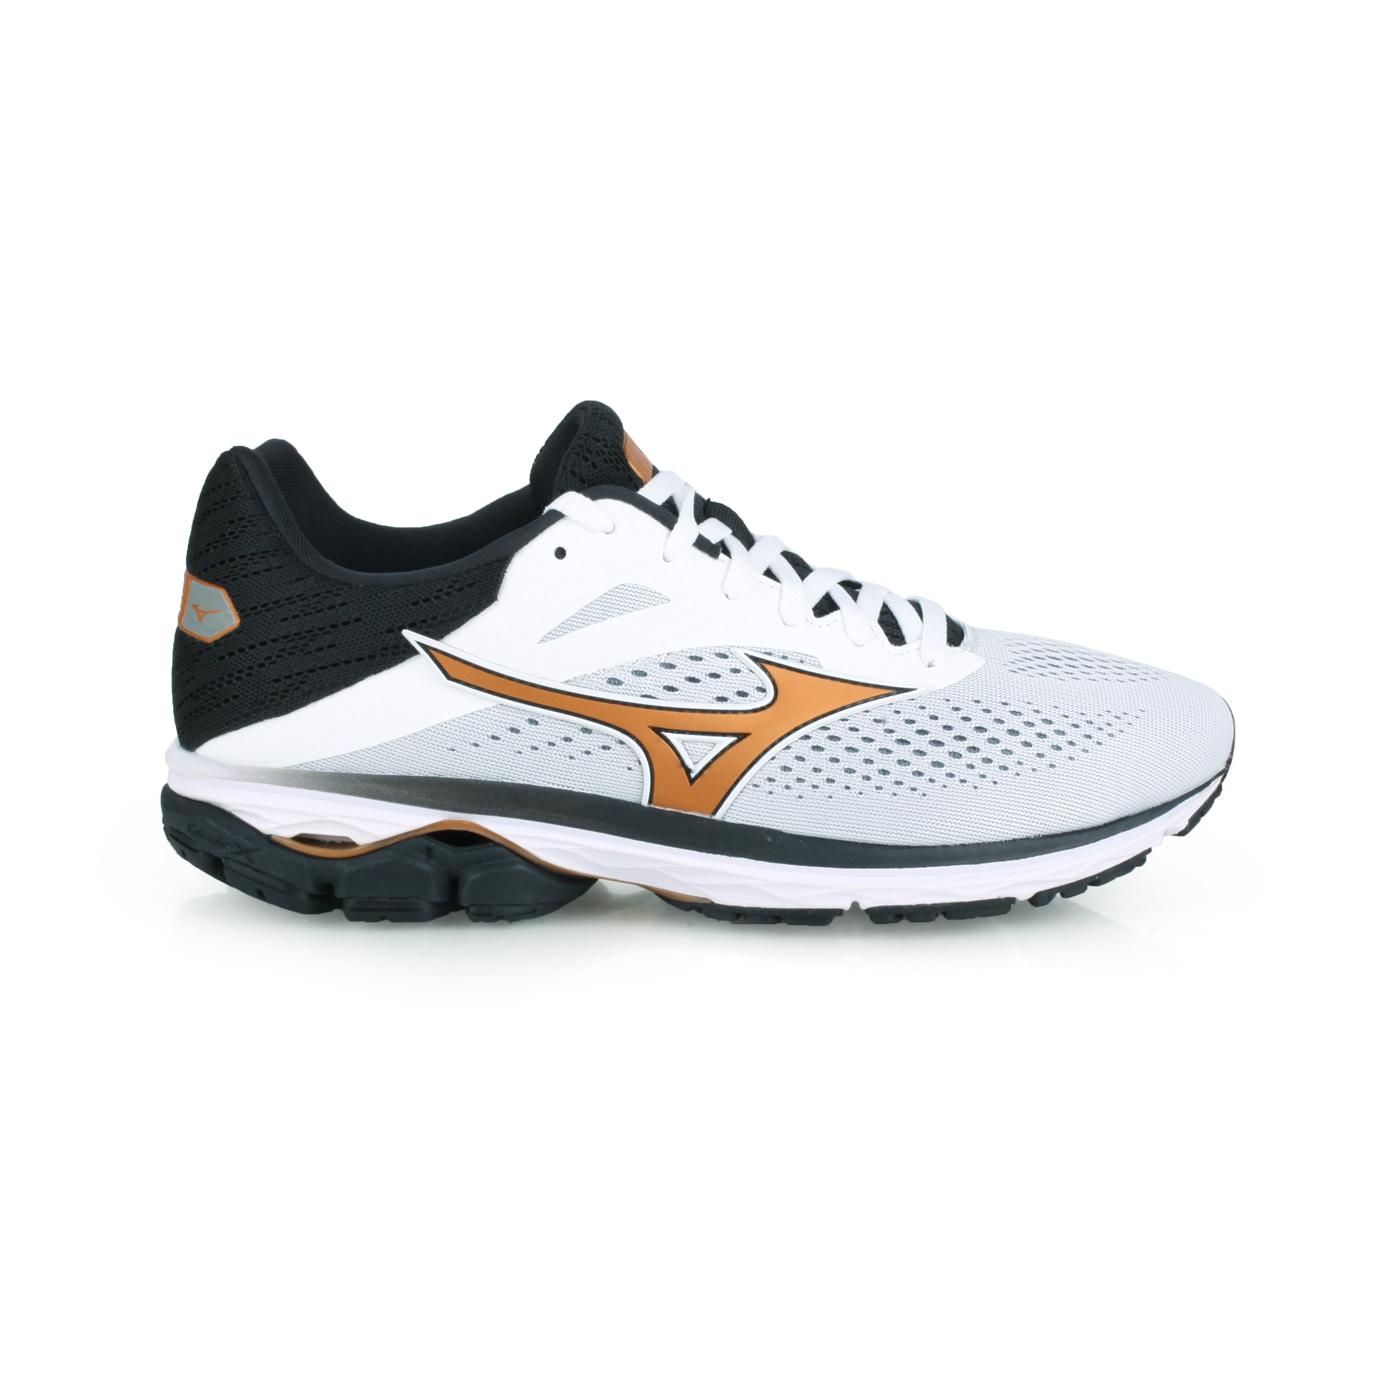 MIZUNO 男款慢跑鞋  @WAVE RIDER 23@J1GC190324 - 灰棕白黑